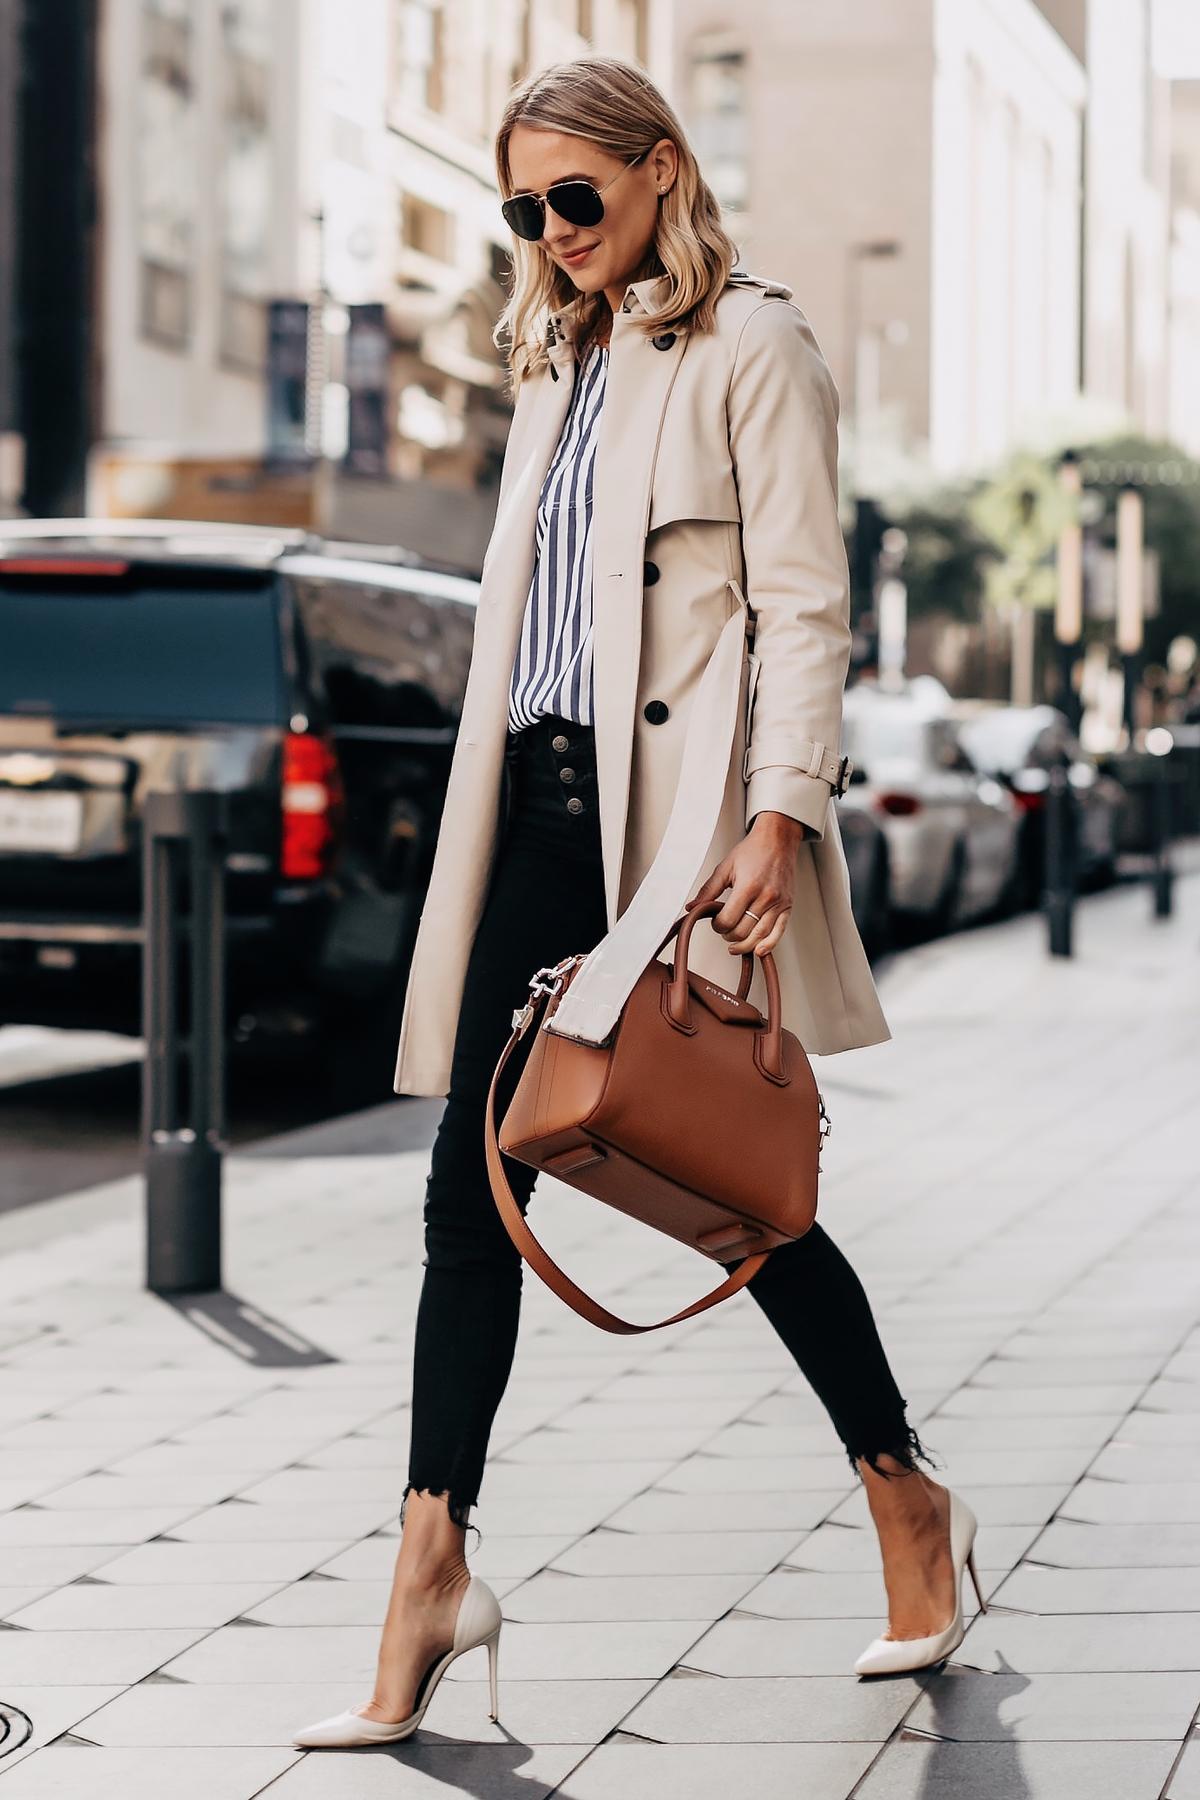 Fashion Jackson Wearing Club Monaco Trench Coat Blue White Stripe Top Black Ripped Skinny Jeans White Pumps Givenchy Antigona Cognac Handbag